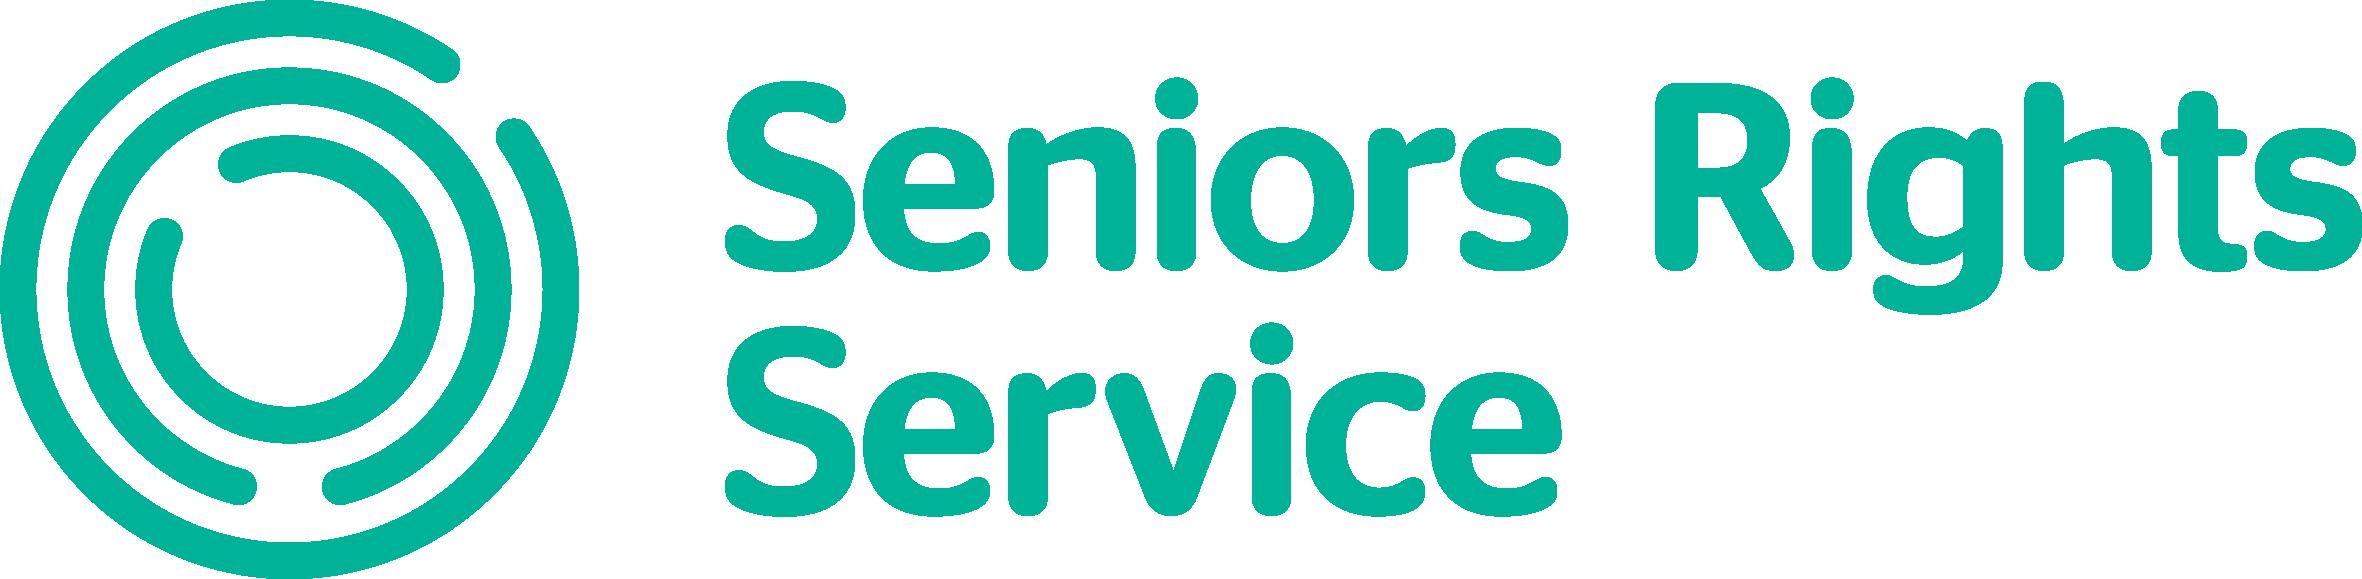 Seniors Rights Service_Stacked_Logo_RGB_600dpi.png